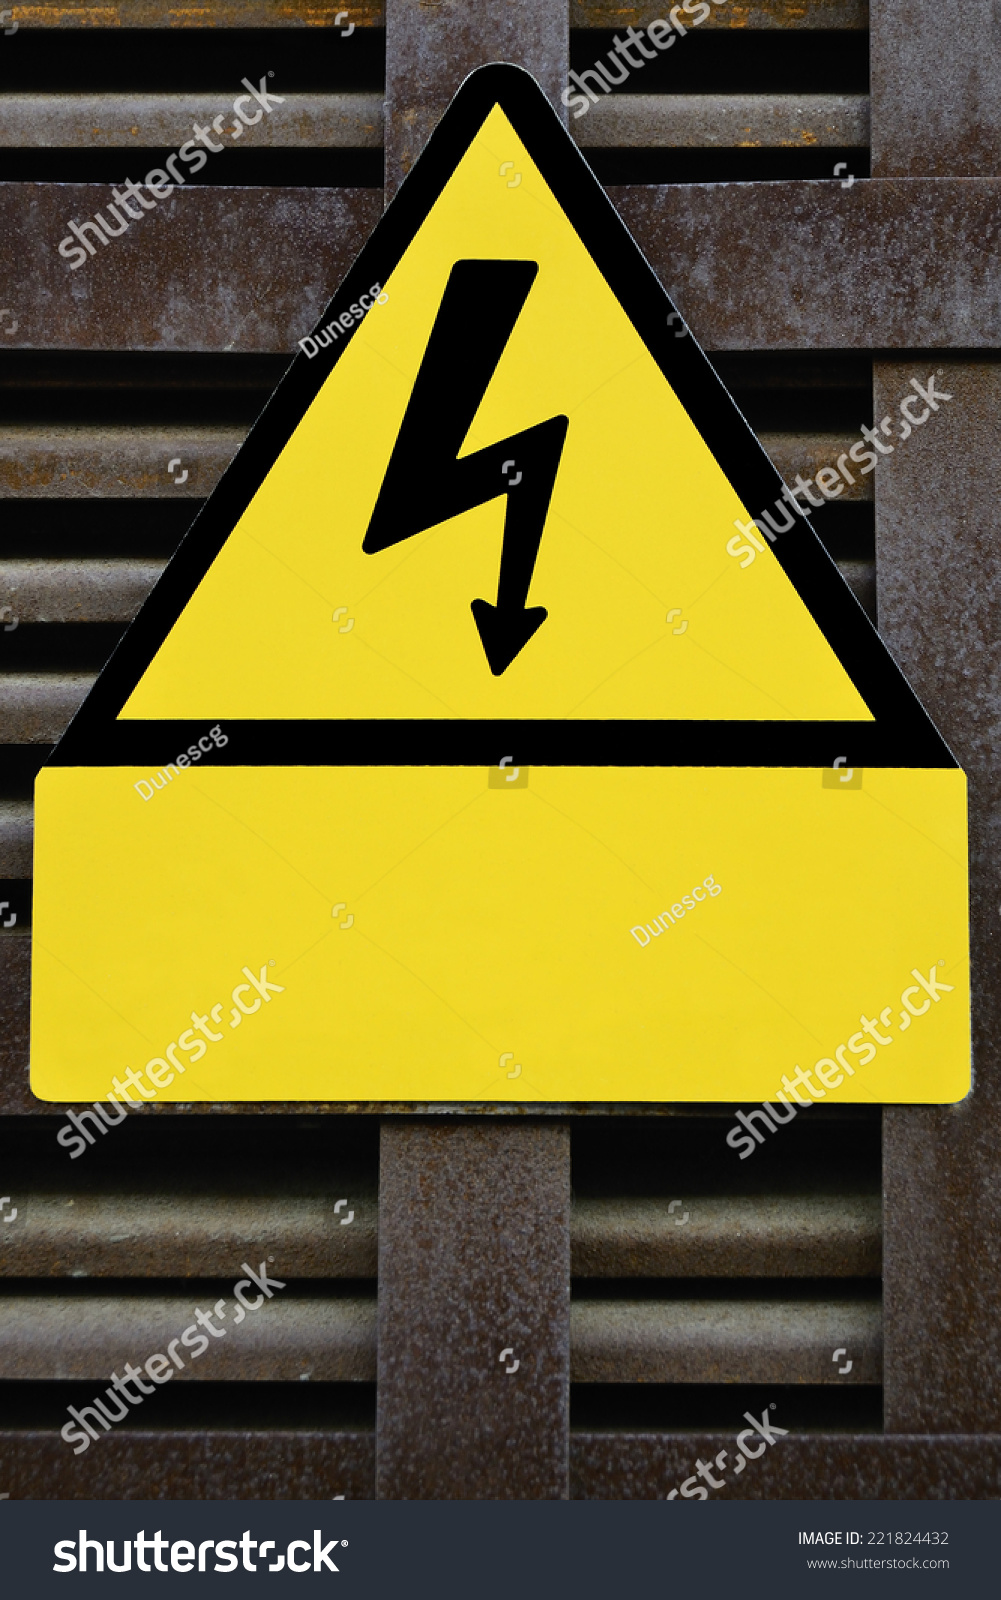 High voltage symbol metallic background stock photo 221824432 high voltage symbol with metallic background buycottarizona